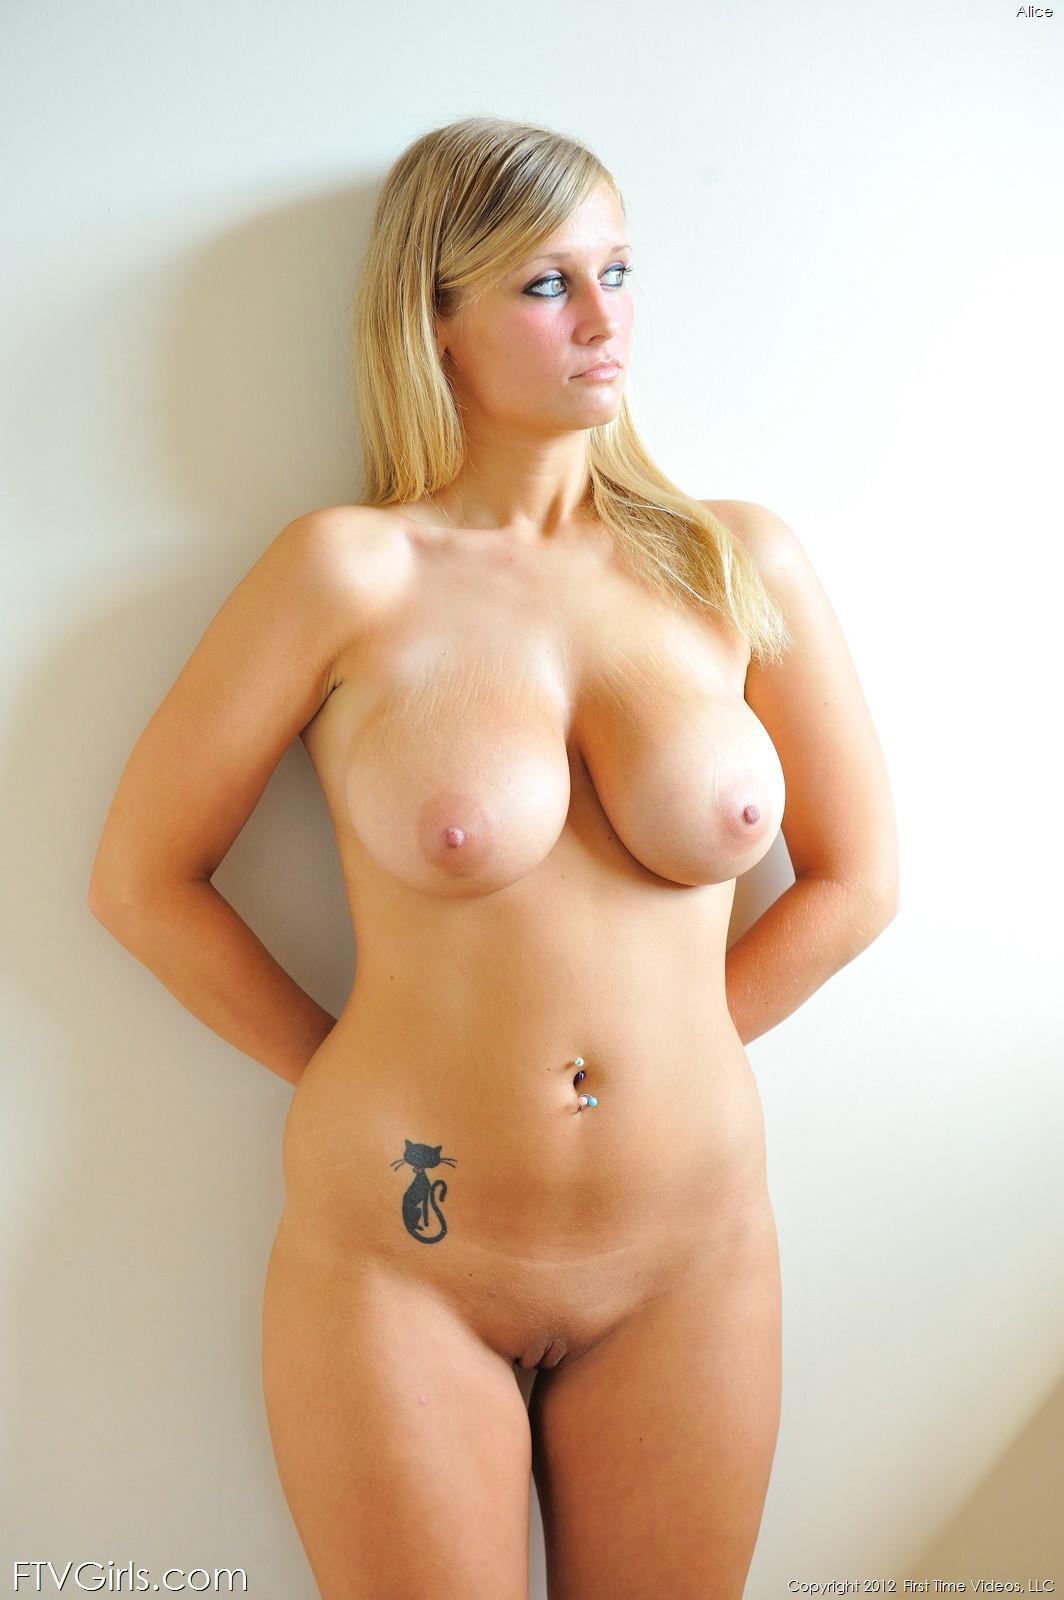 porno norge gratis sex annonser